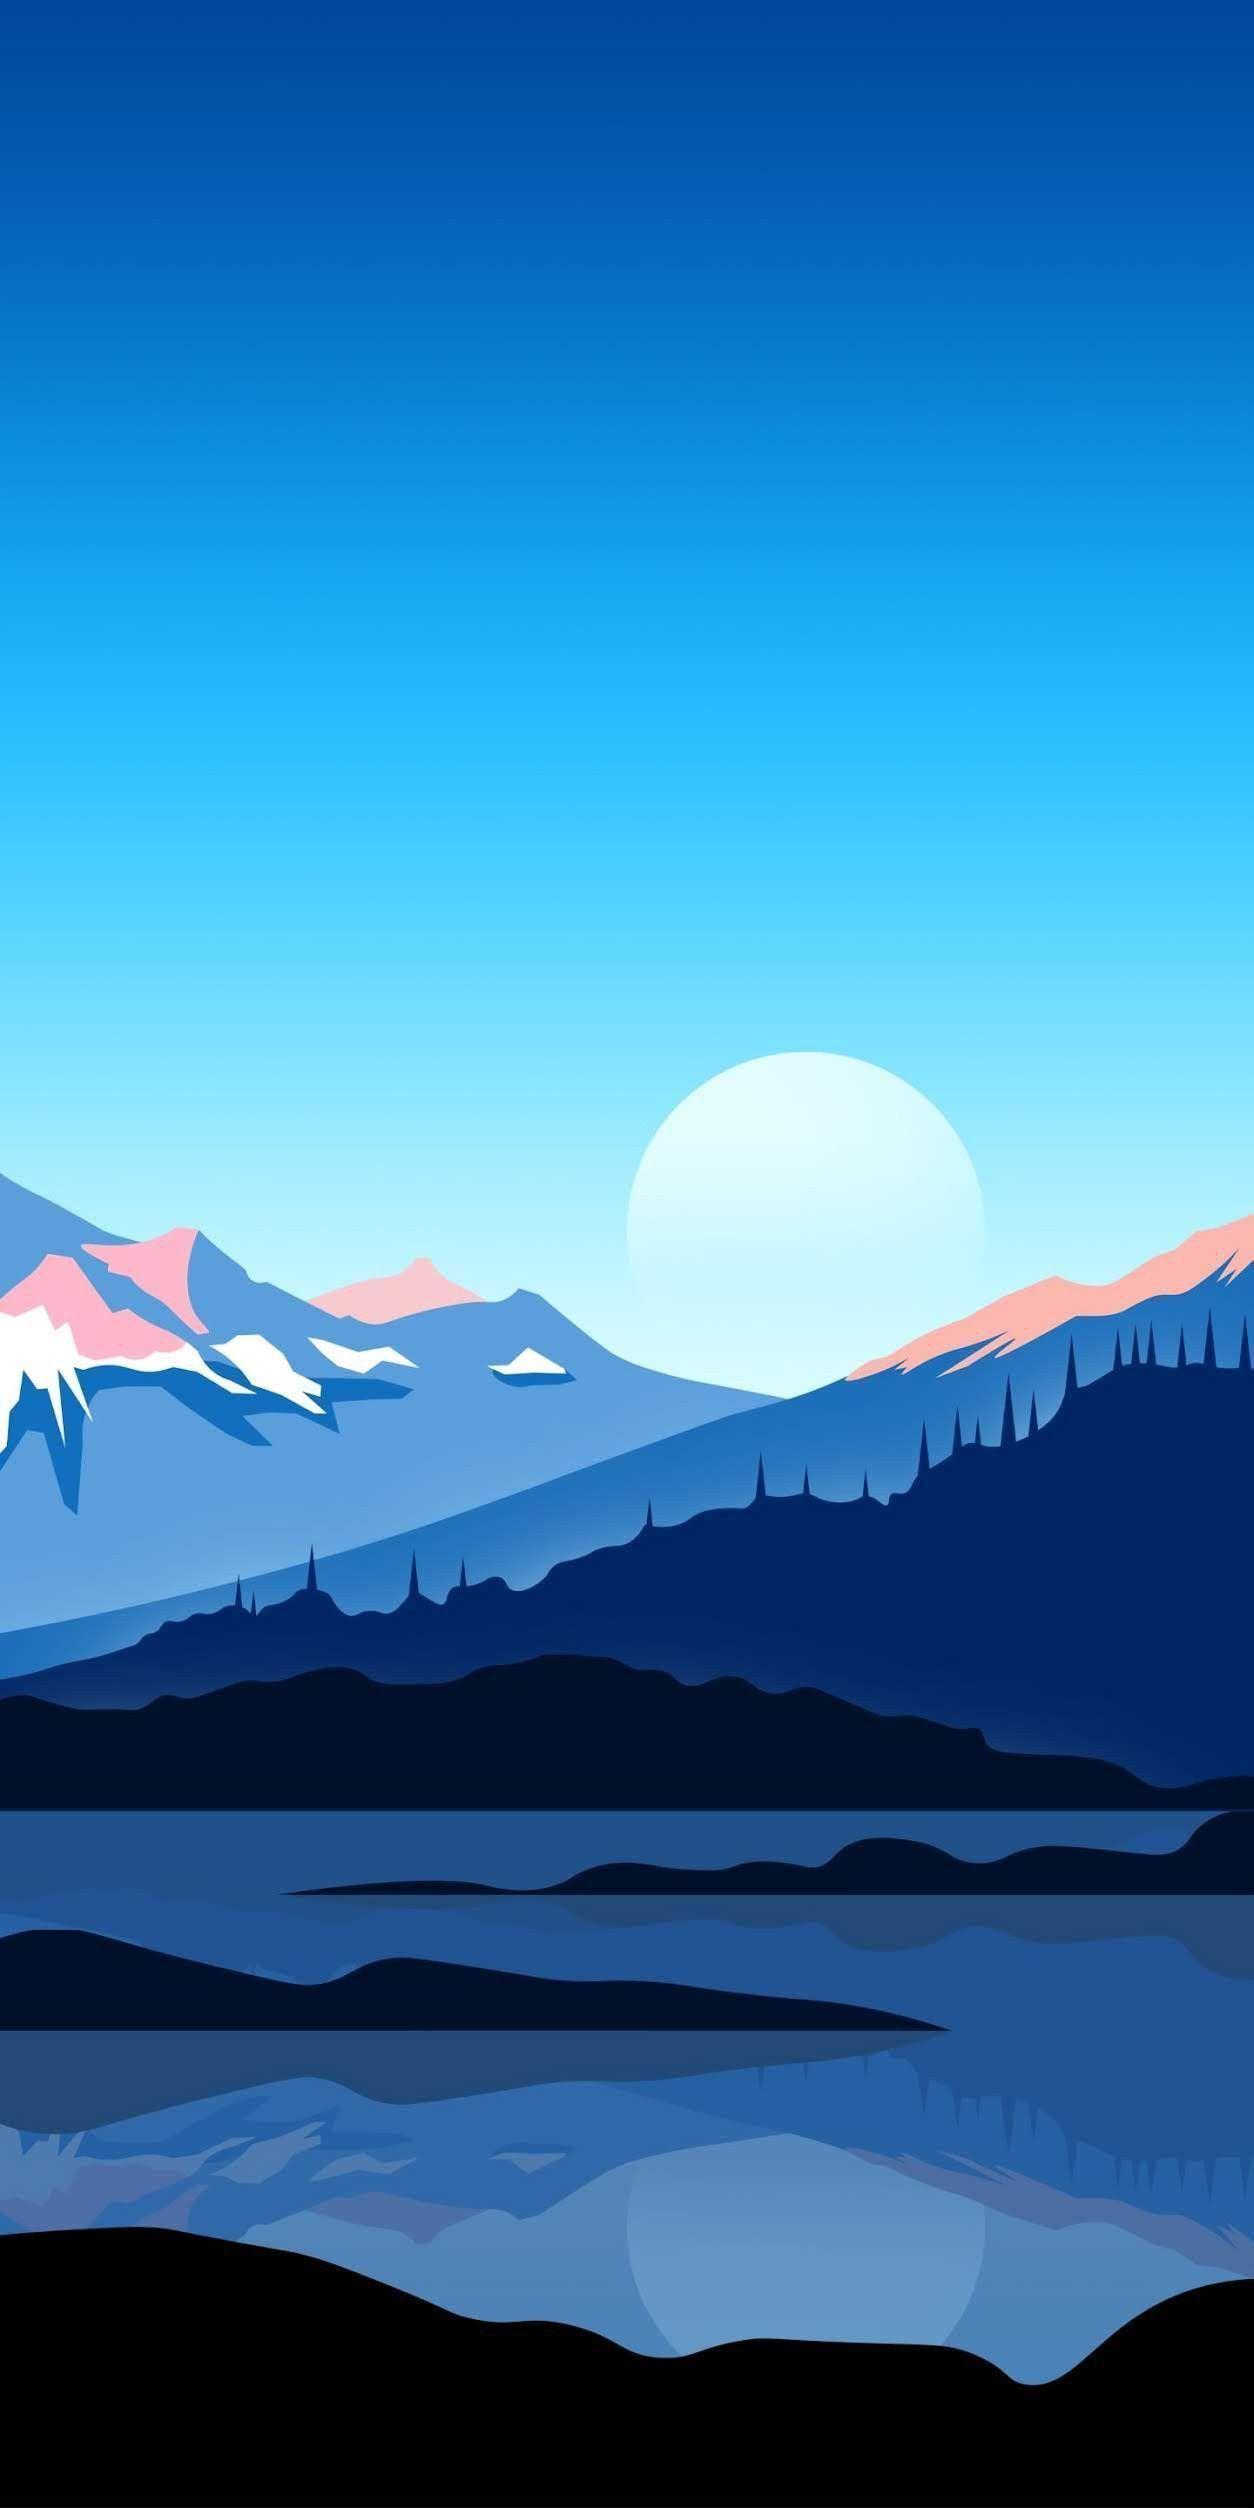 Samsung Wallpaper Minimalist Hintergrundbild Tapete Samsung Wallpaper Blue Hi Full Hd 4k Scenery Wallpaper Landscape Wallpaper Minimalist Wallpaper